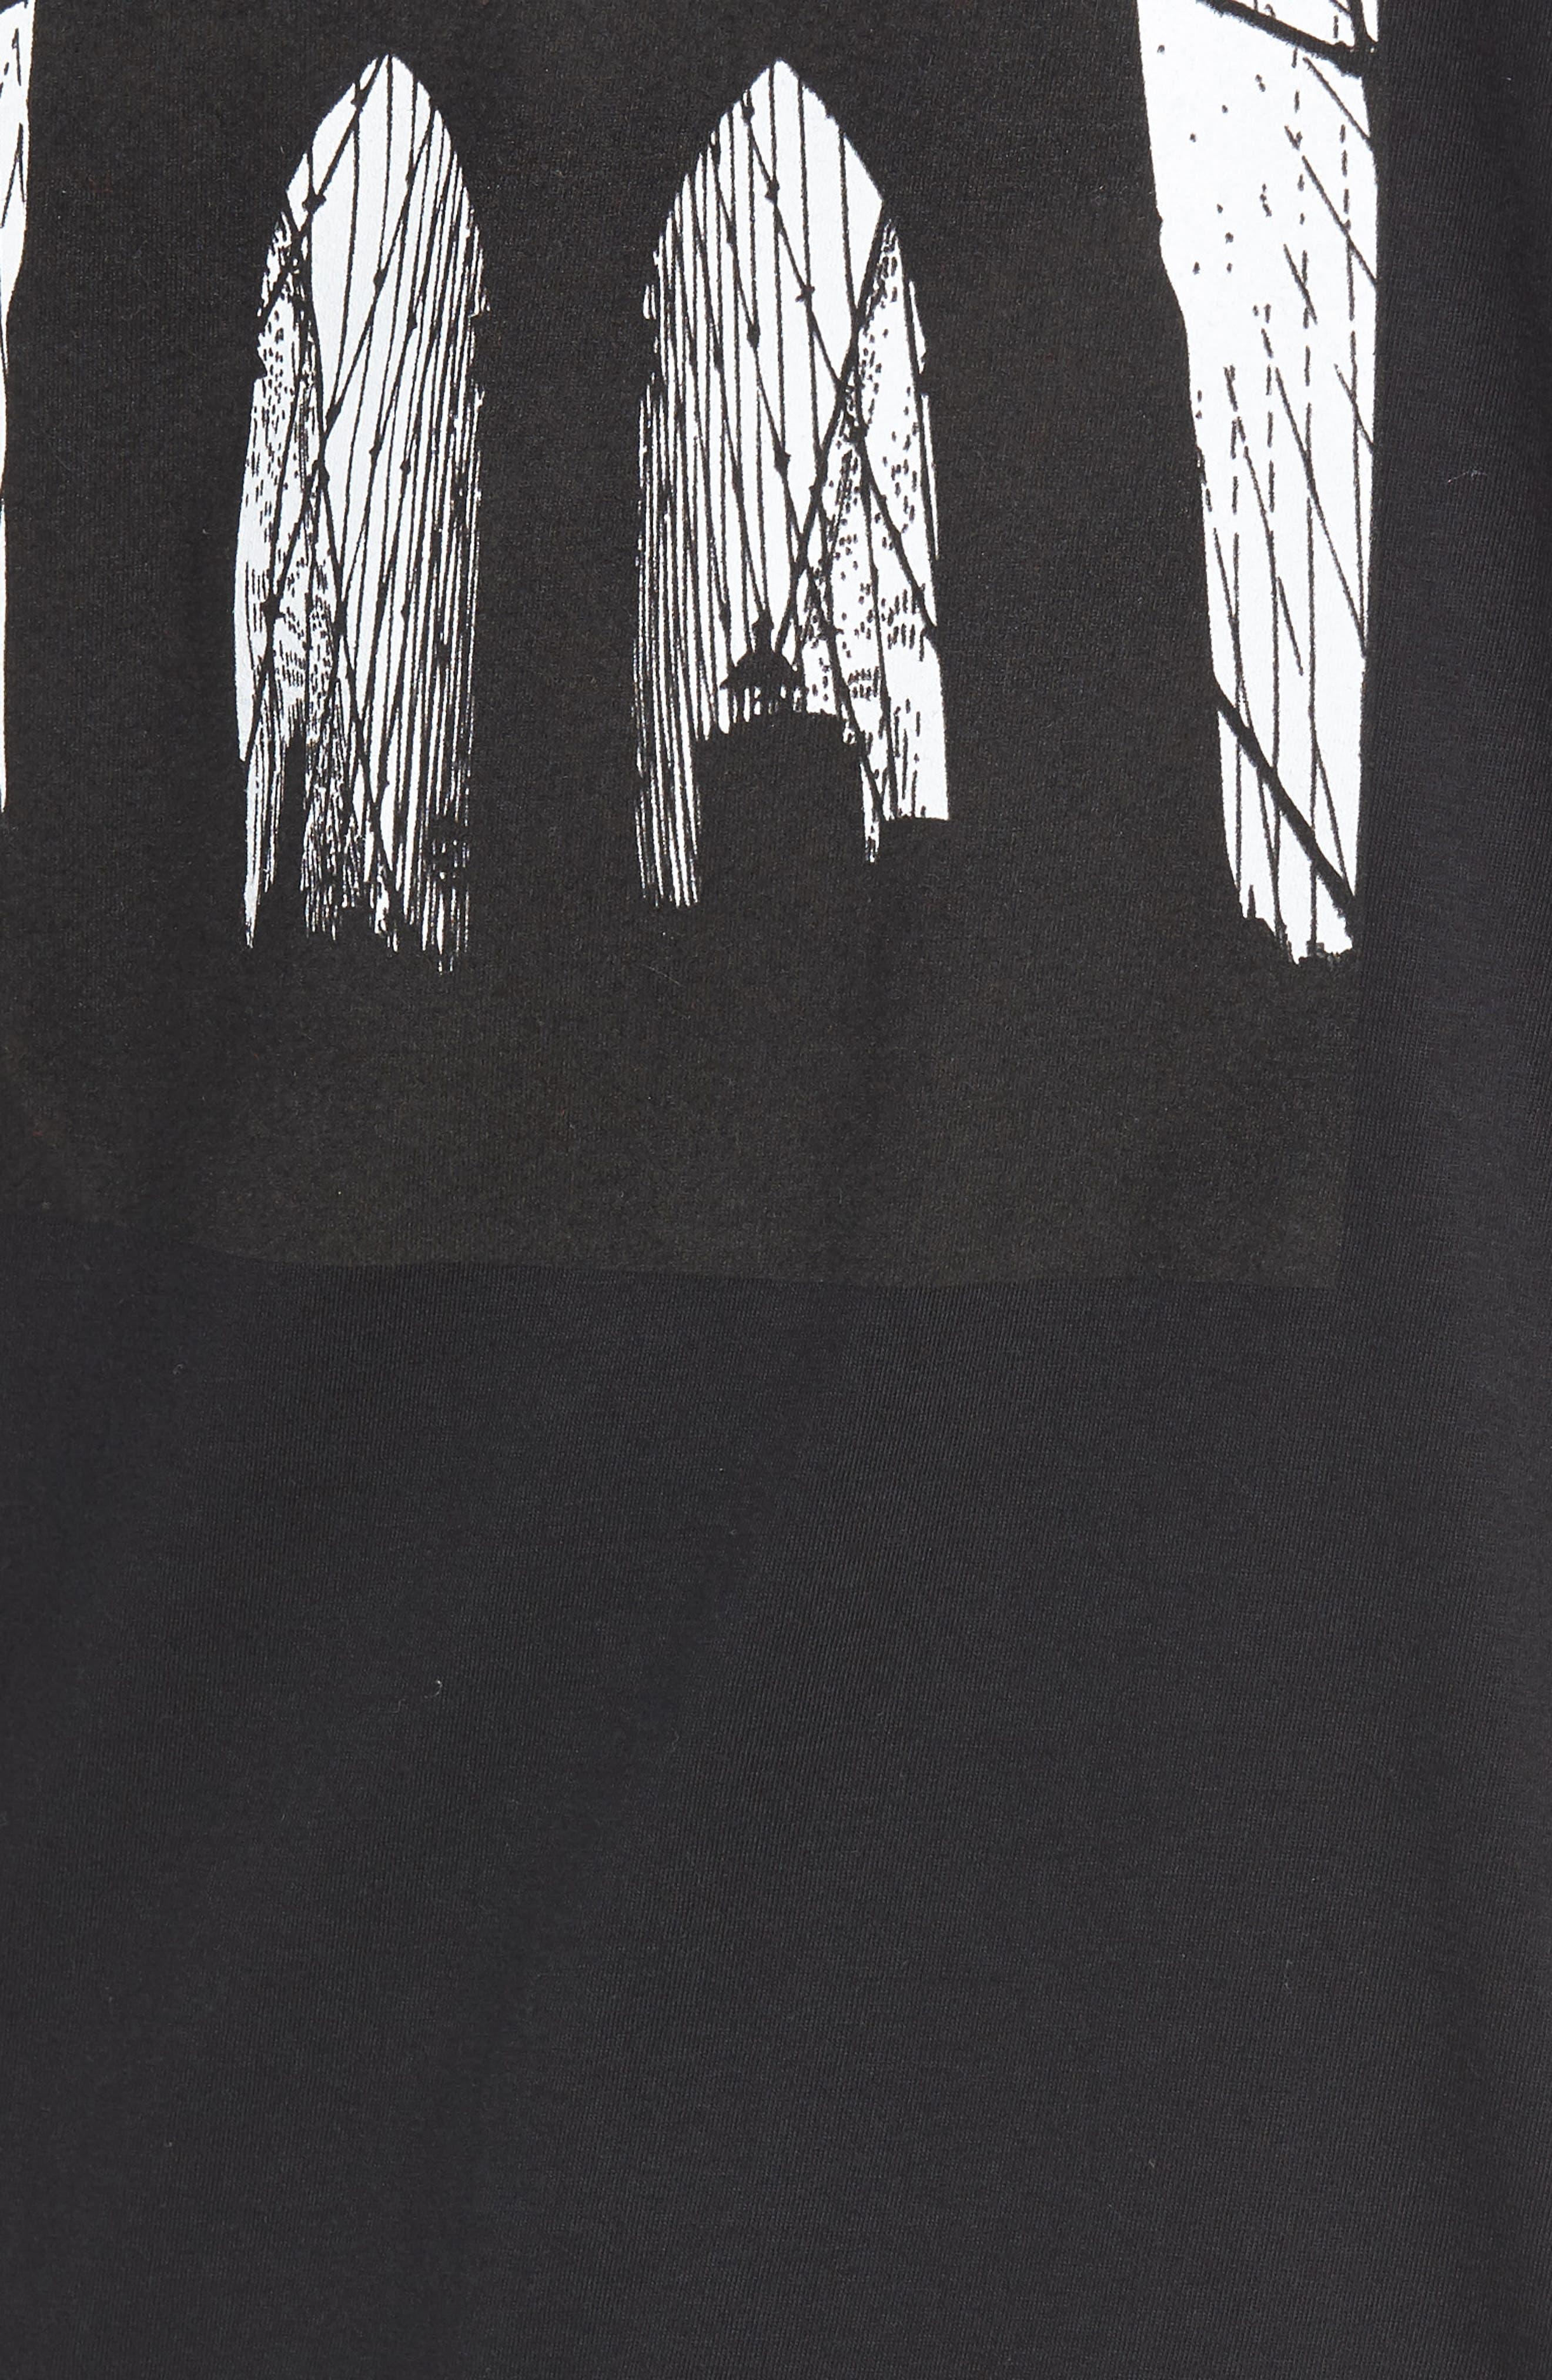 Brooklyn Bridge Graphic T-Shirt,                             Alternate thumbnail 9, color,